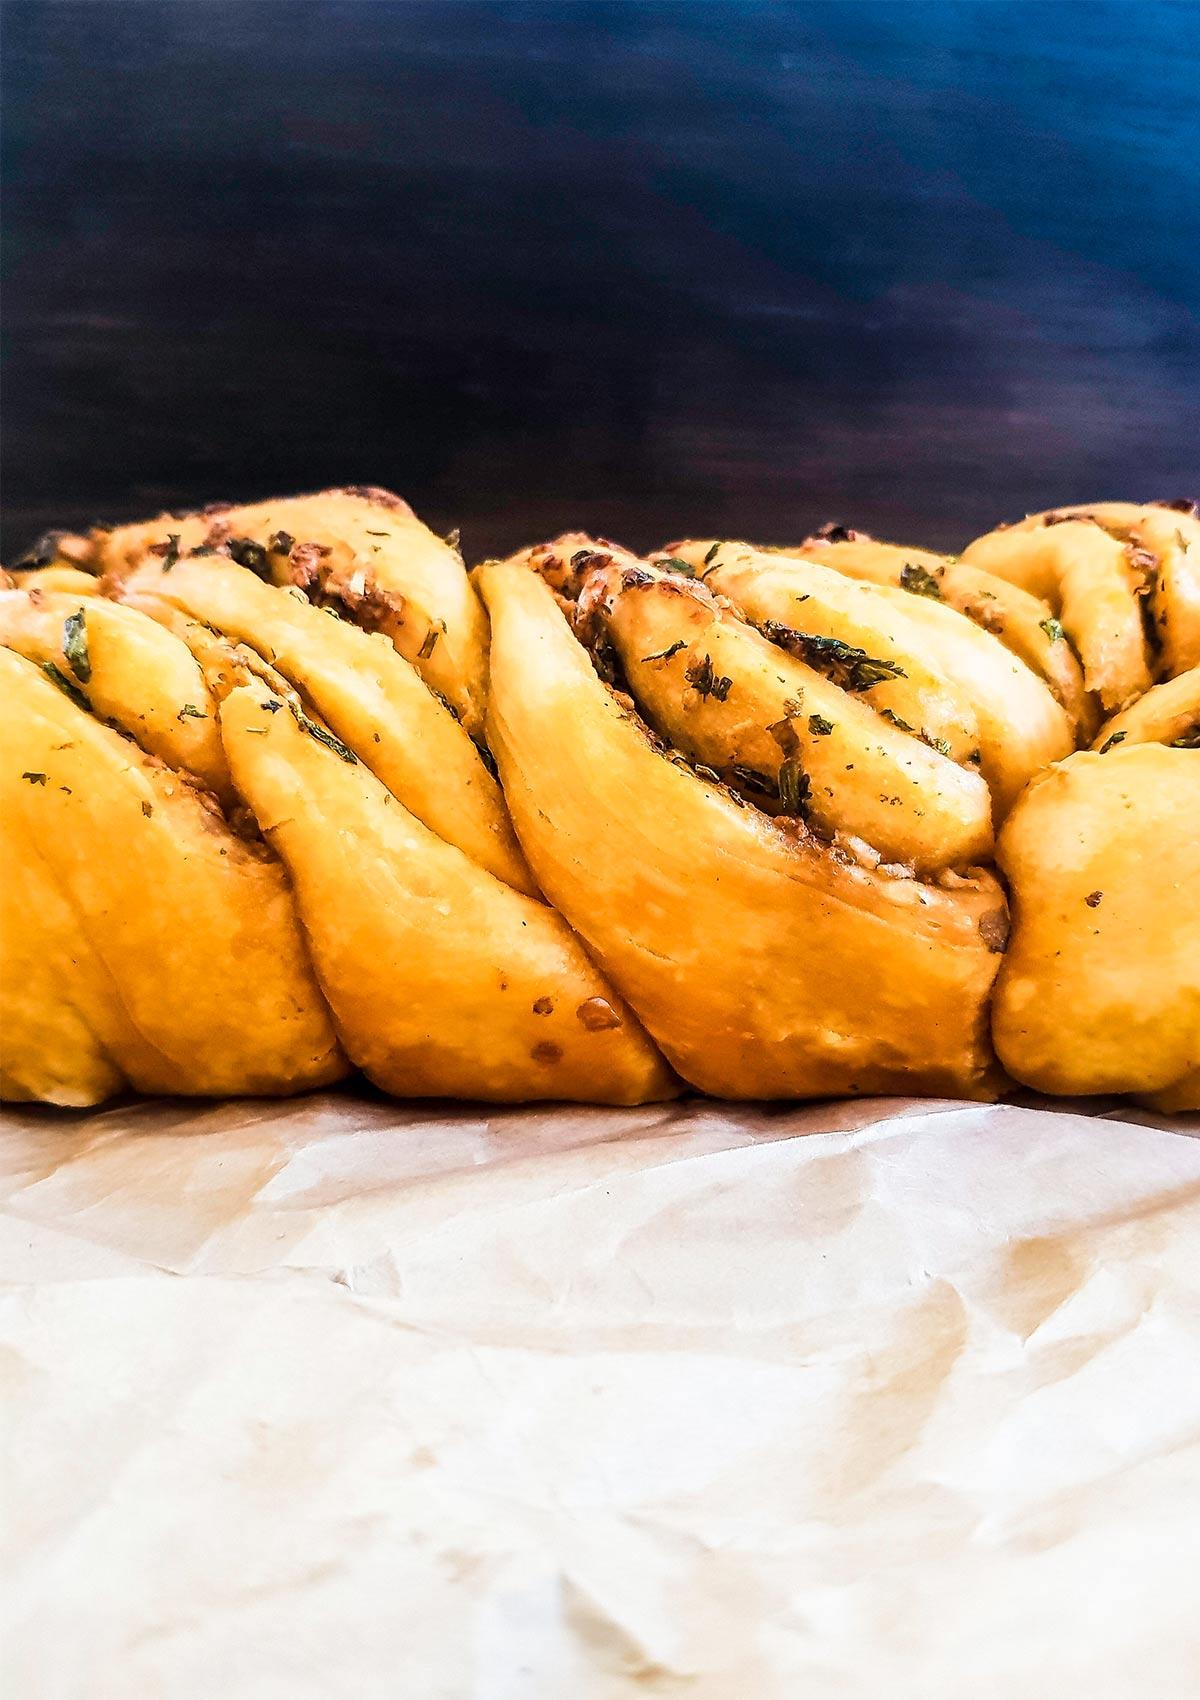 babka bread side view